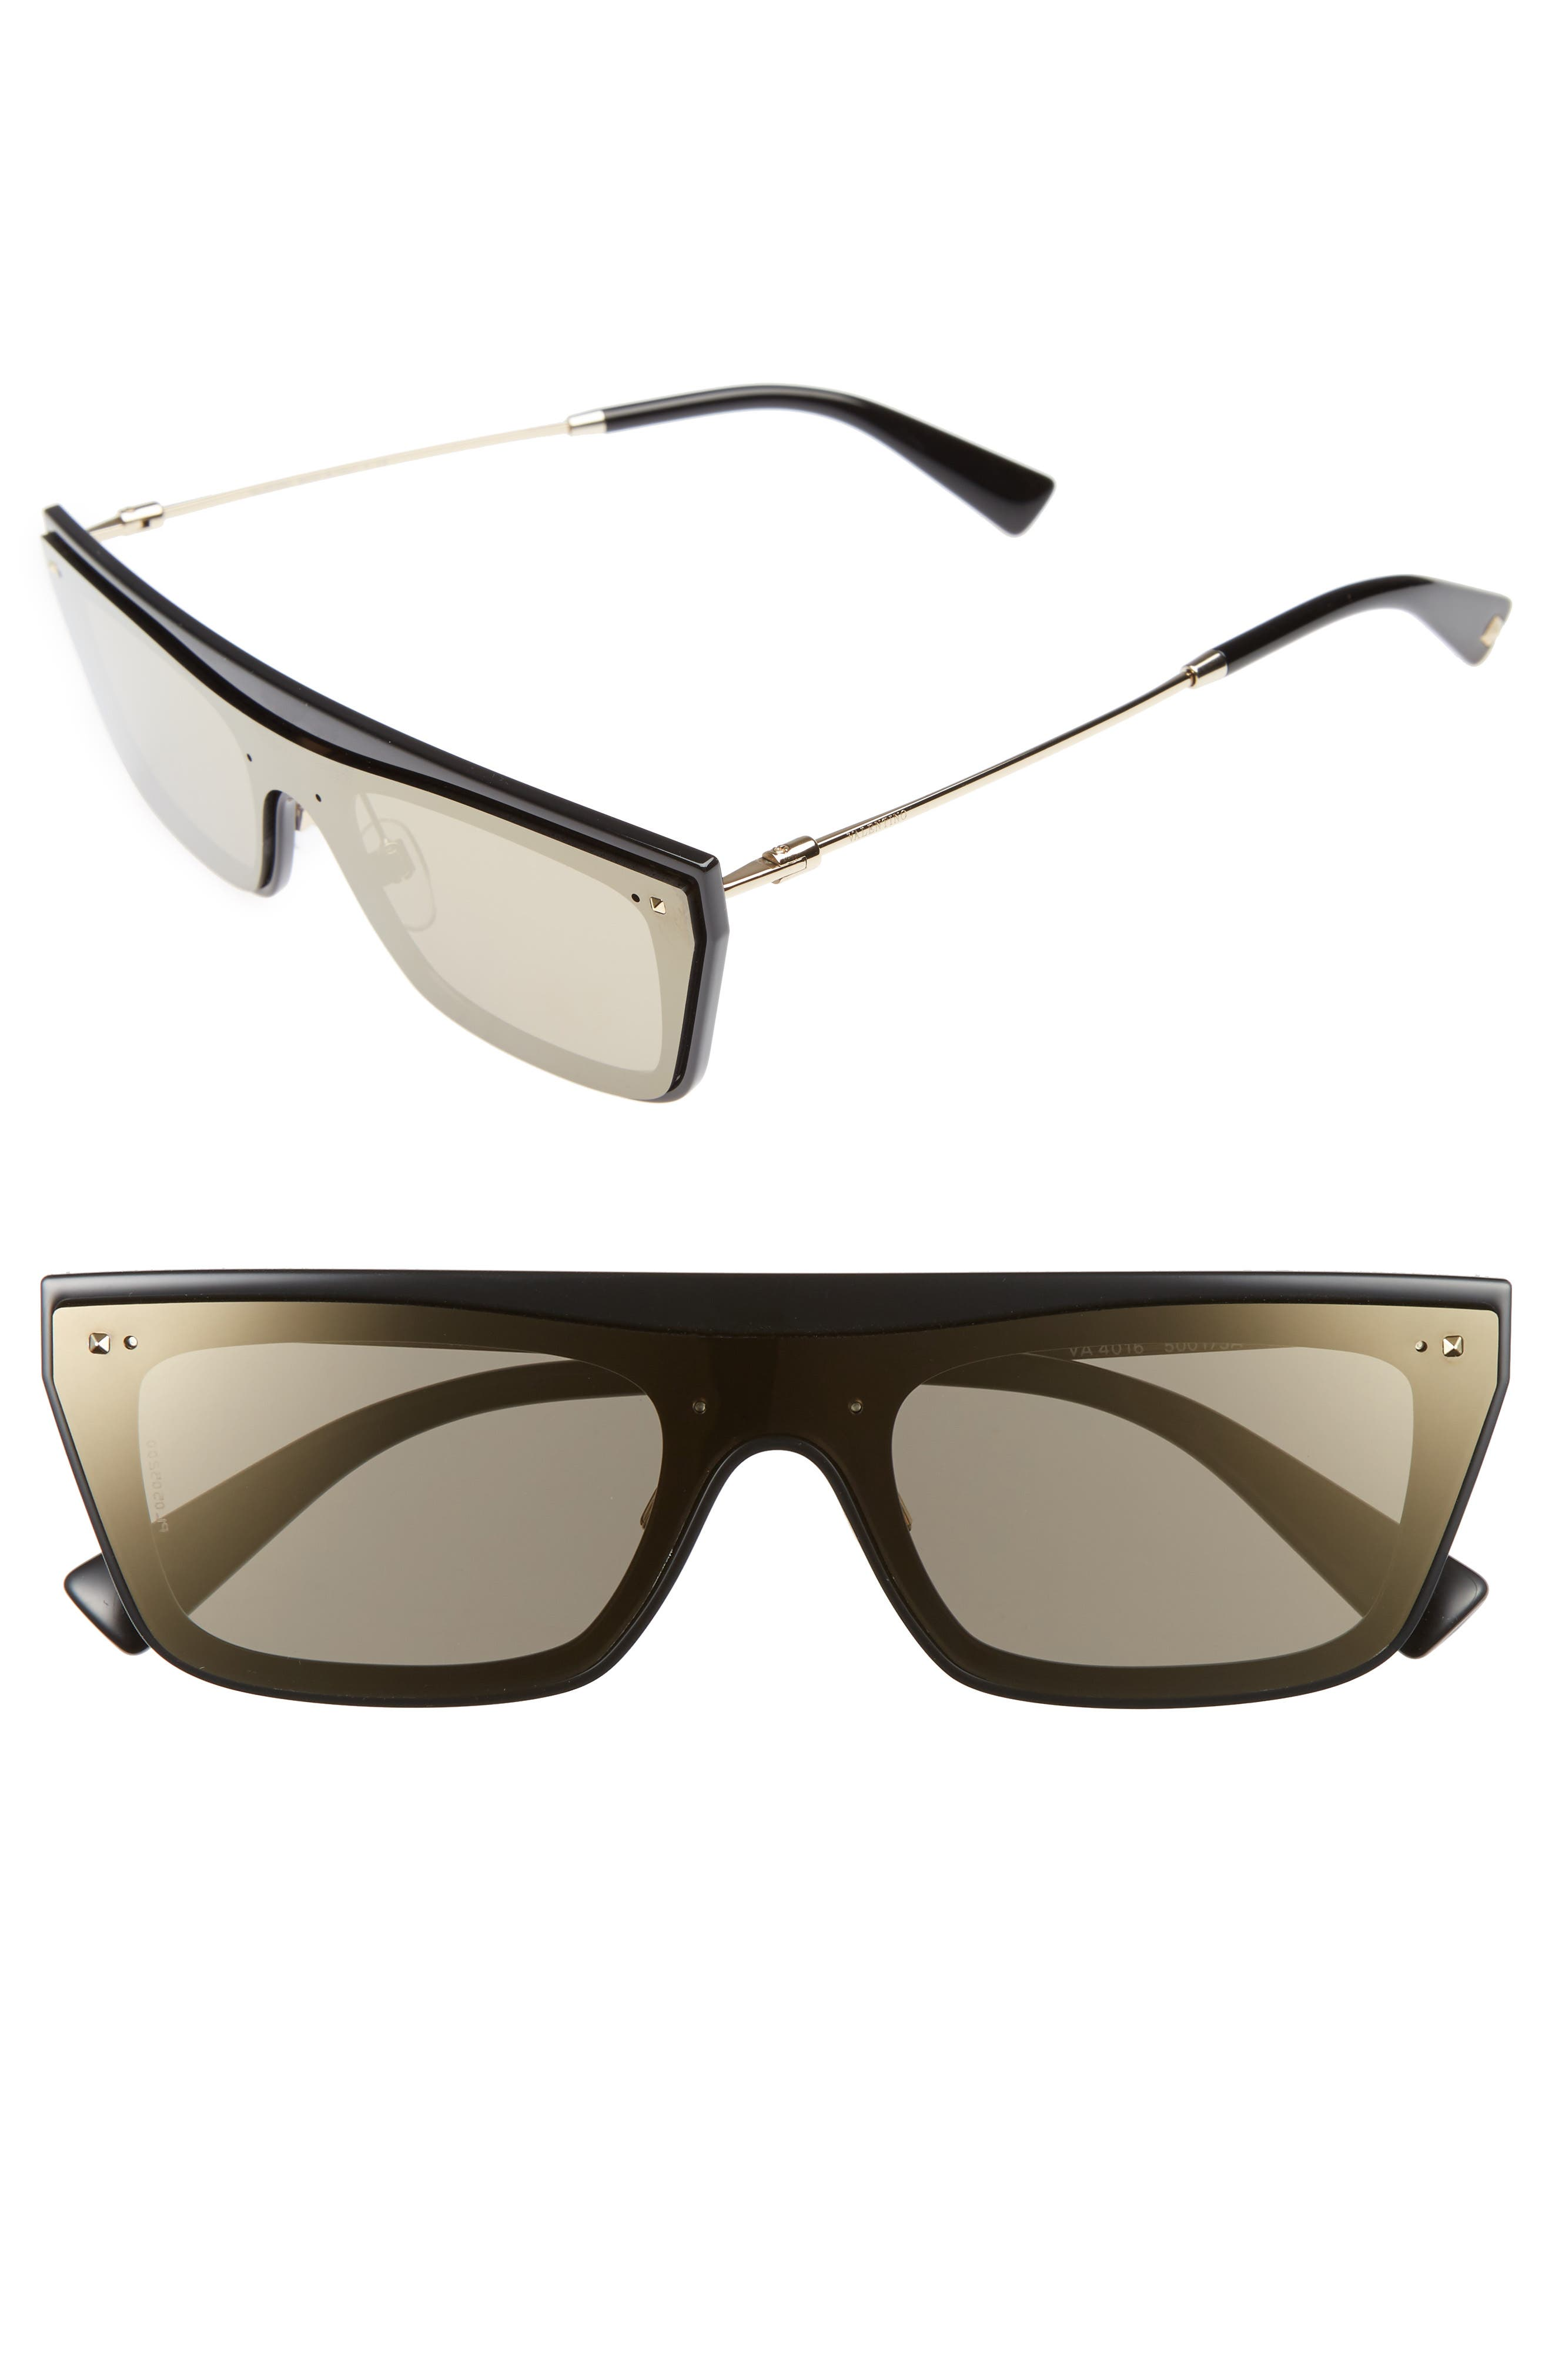 Main Image - Valentino Rockstud 50mm Rectangular Sunglasses